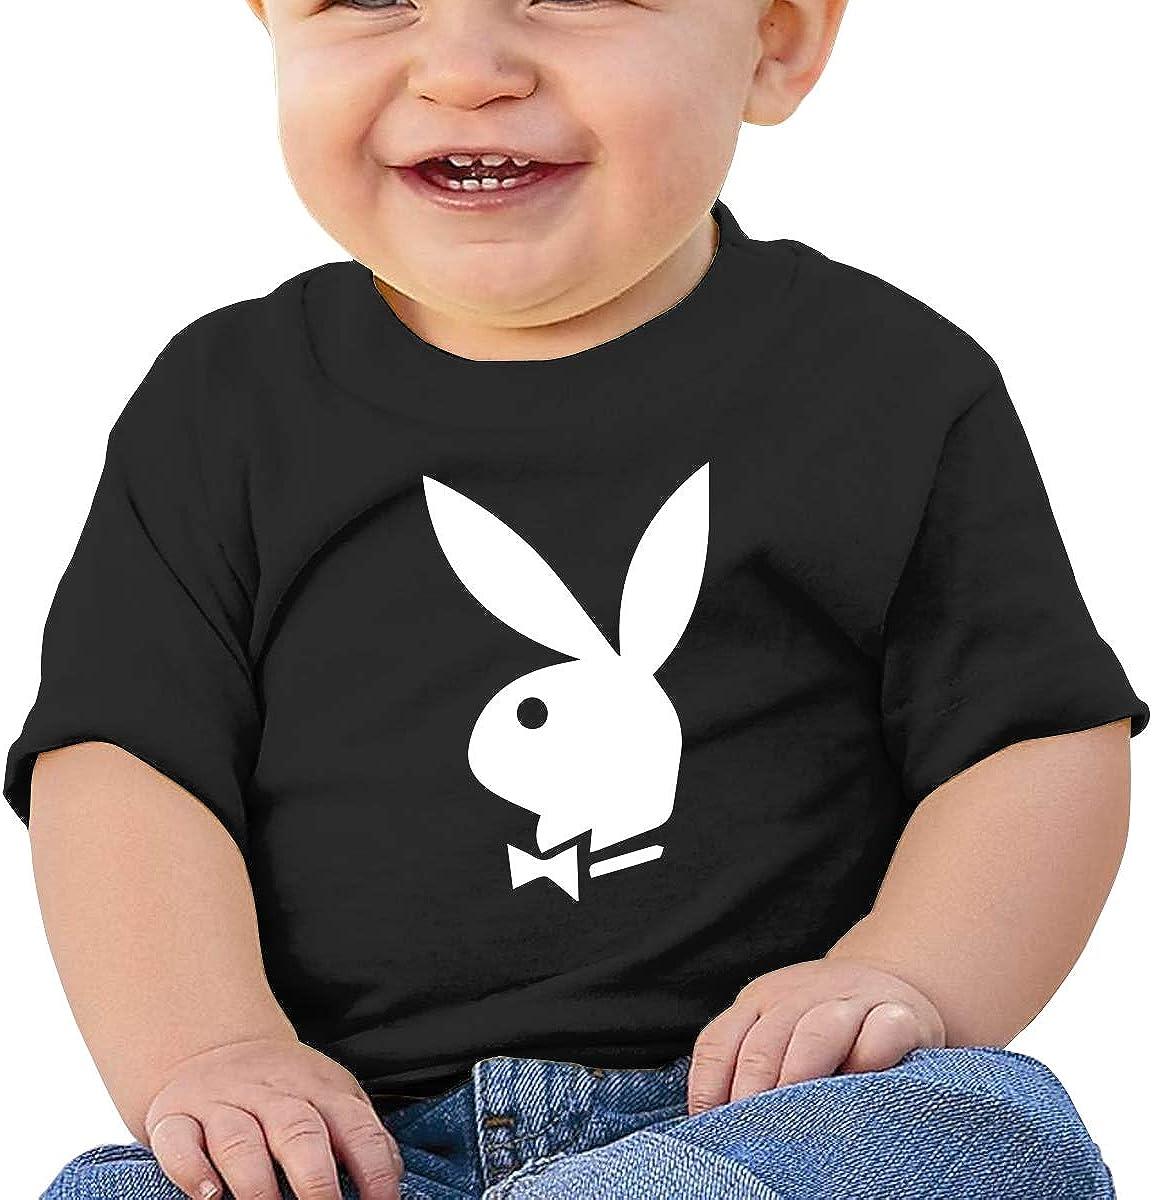 ANDREWPEO Baby Playboi Carti Shirts Toddler Fashion Short Tee